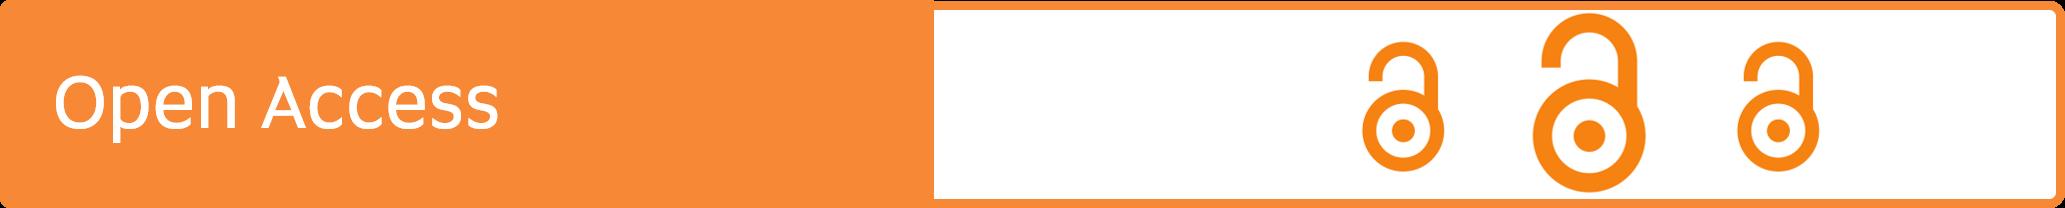 Open Access guide banner